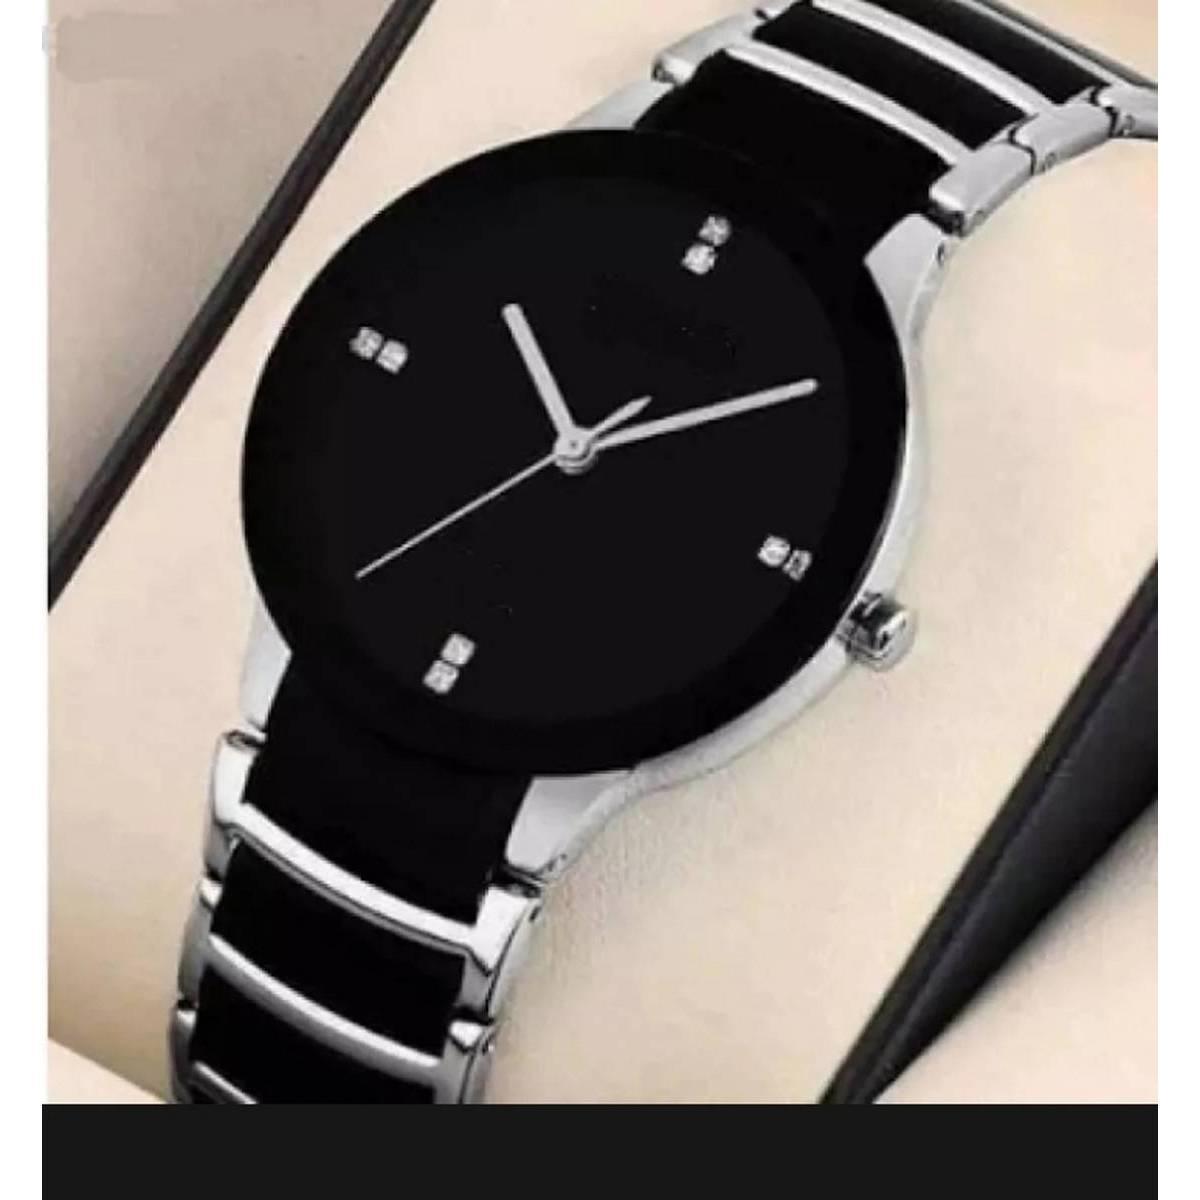 Stylish Handsome Silver Black Watch